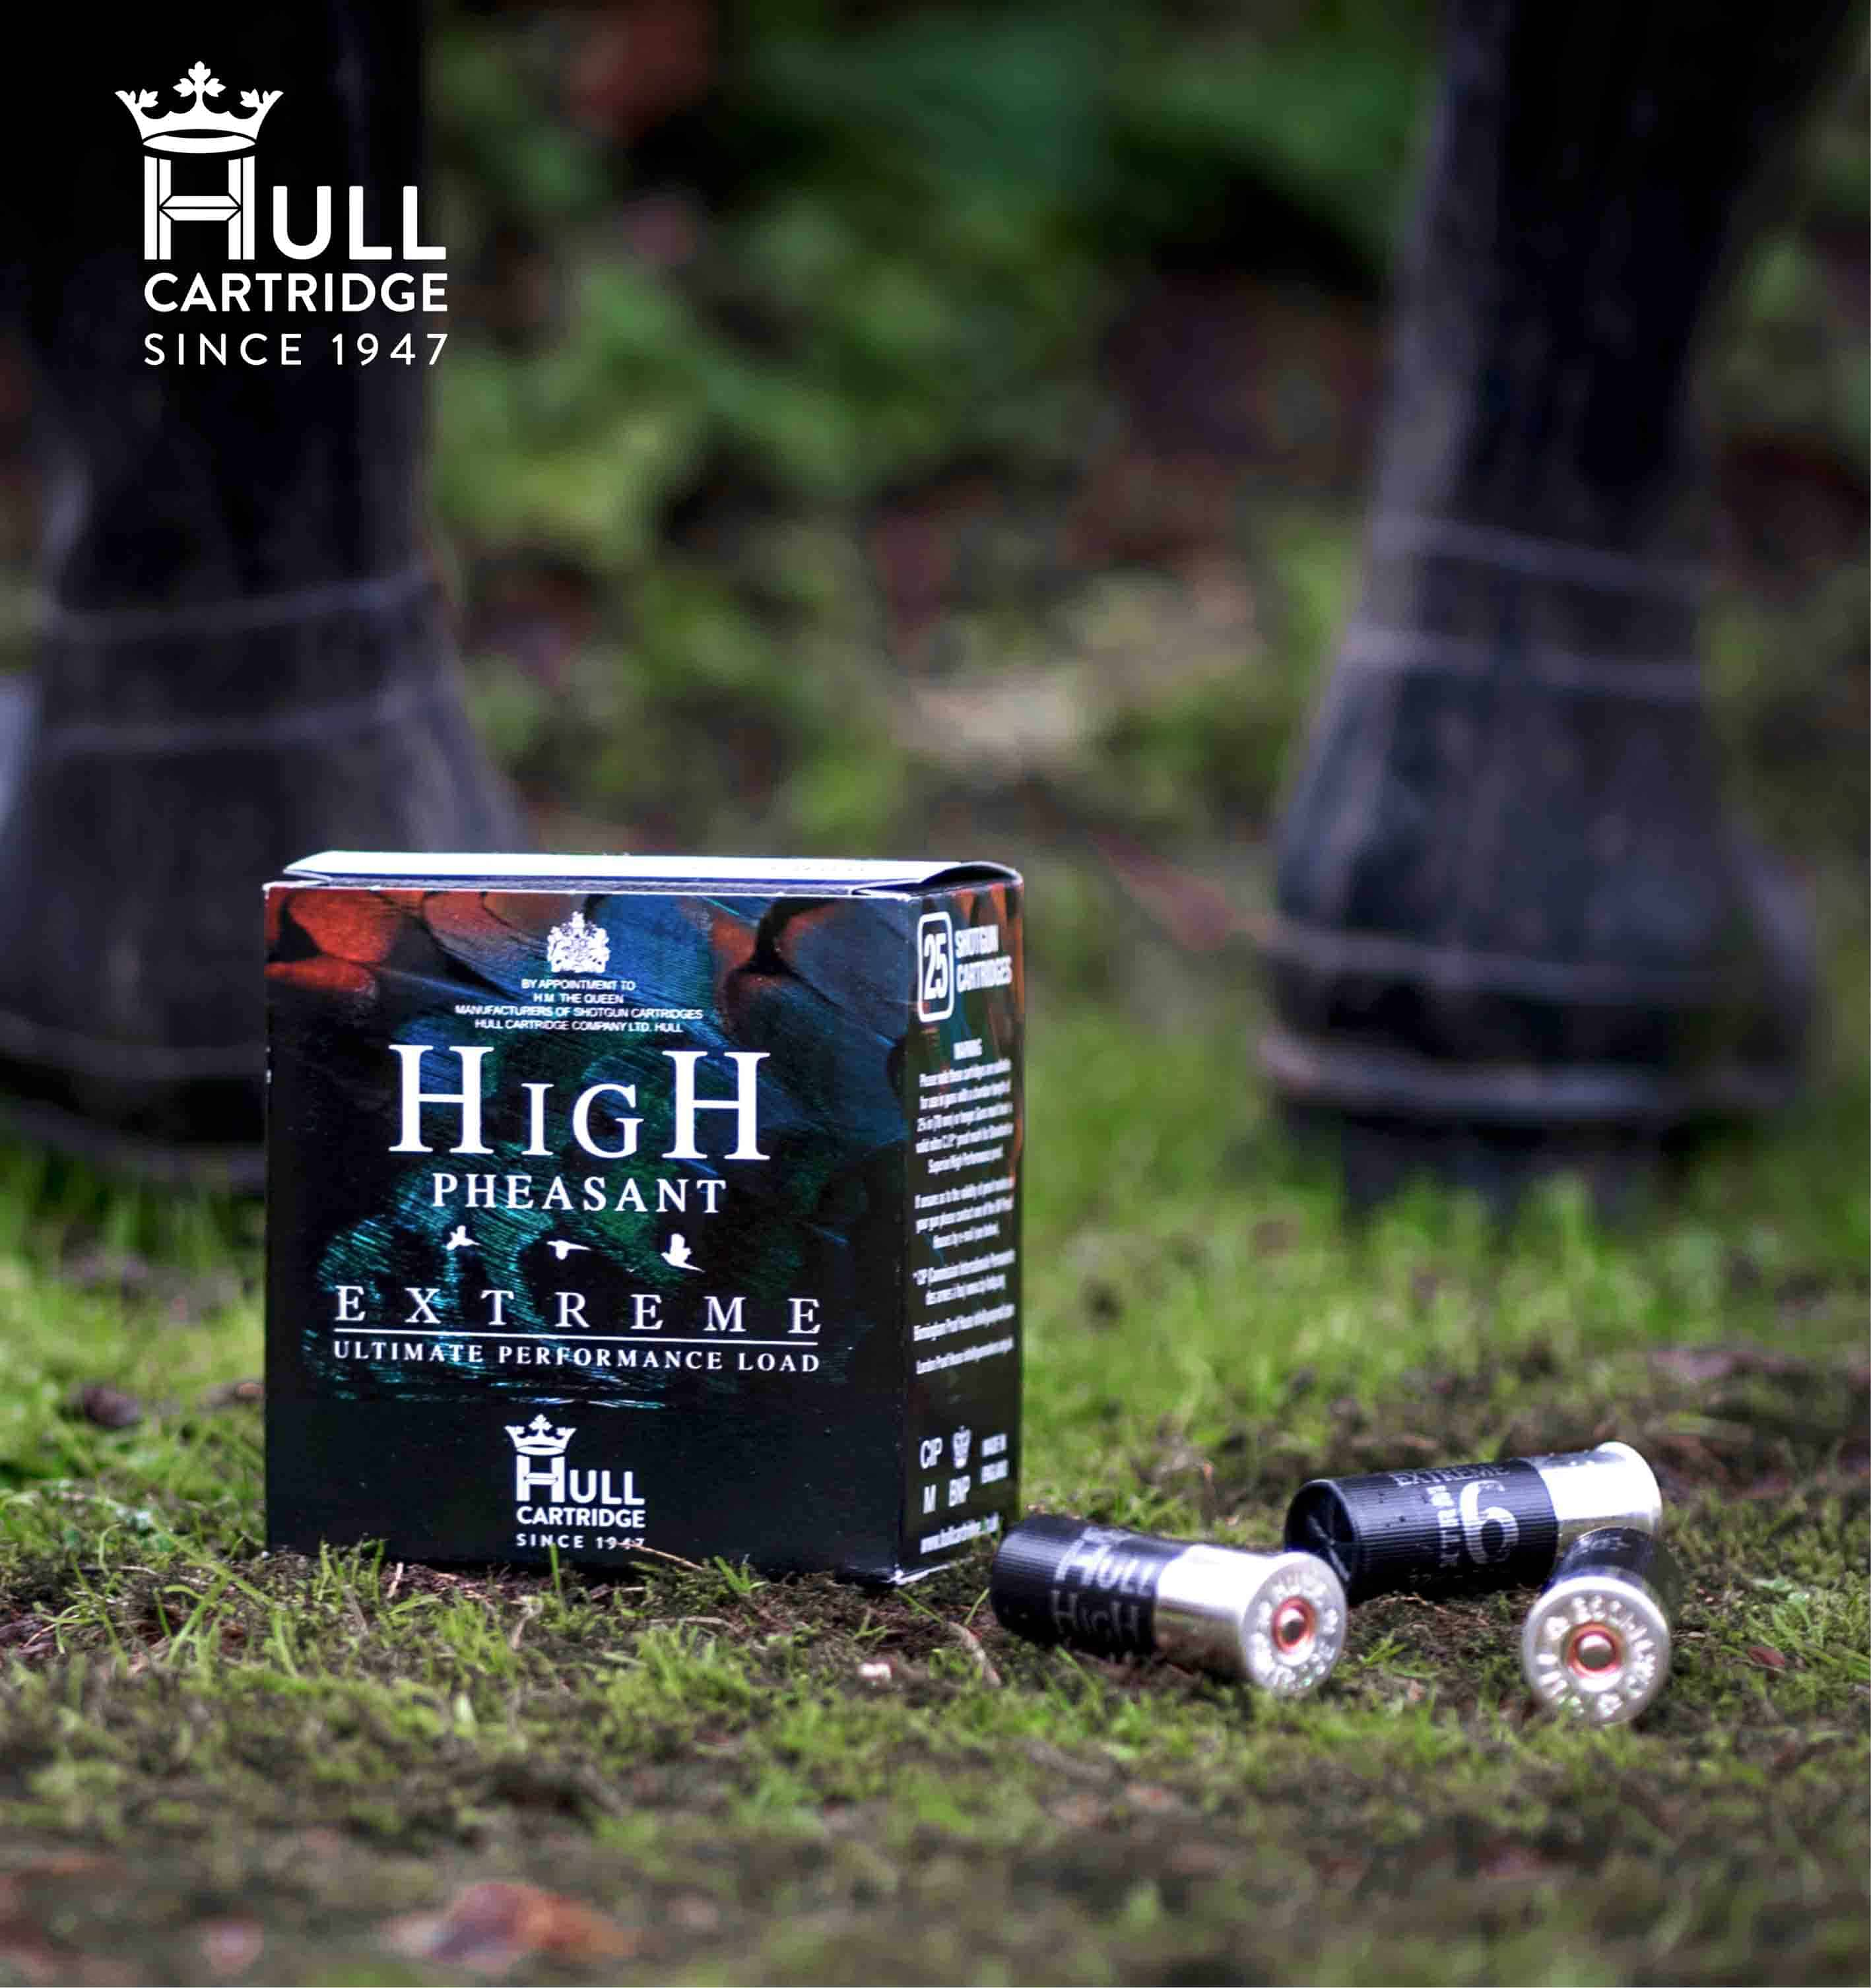 Hull Cartridge High Pheasant Extreme